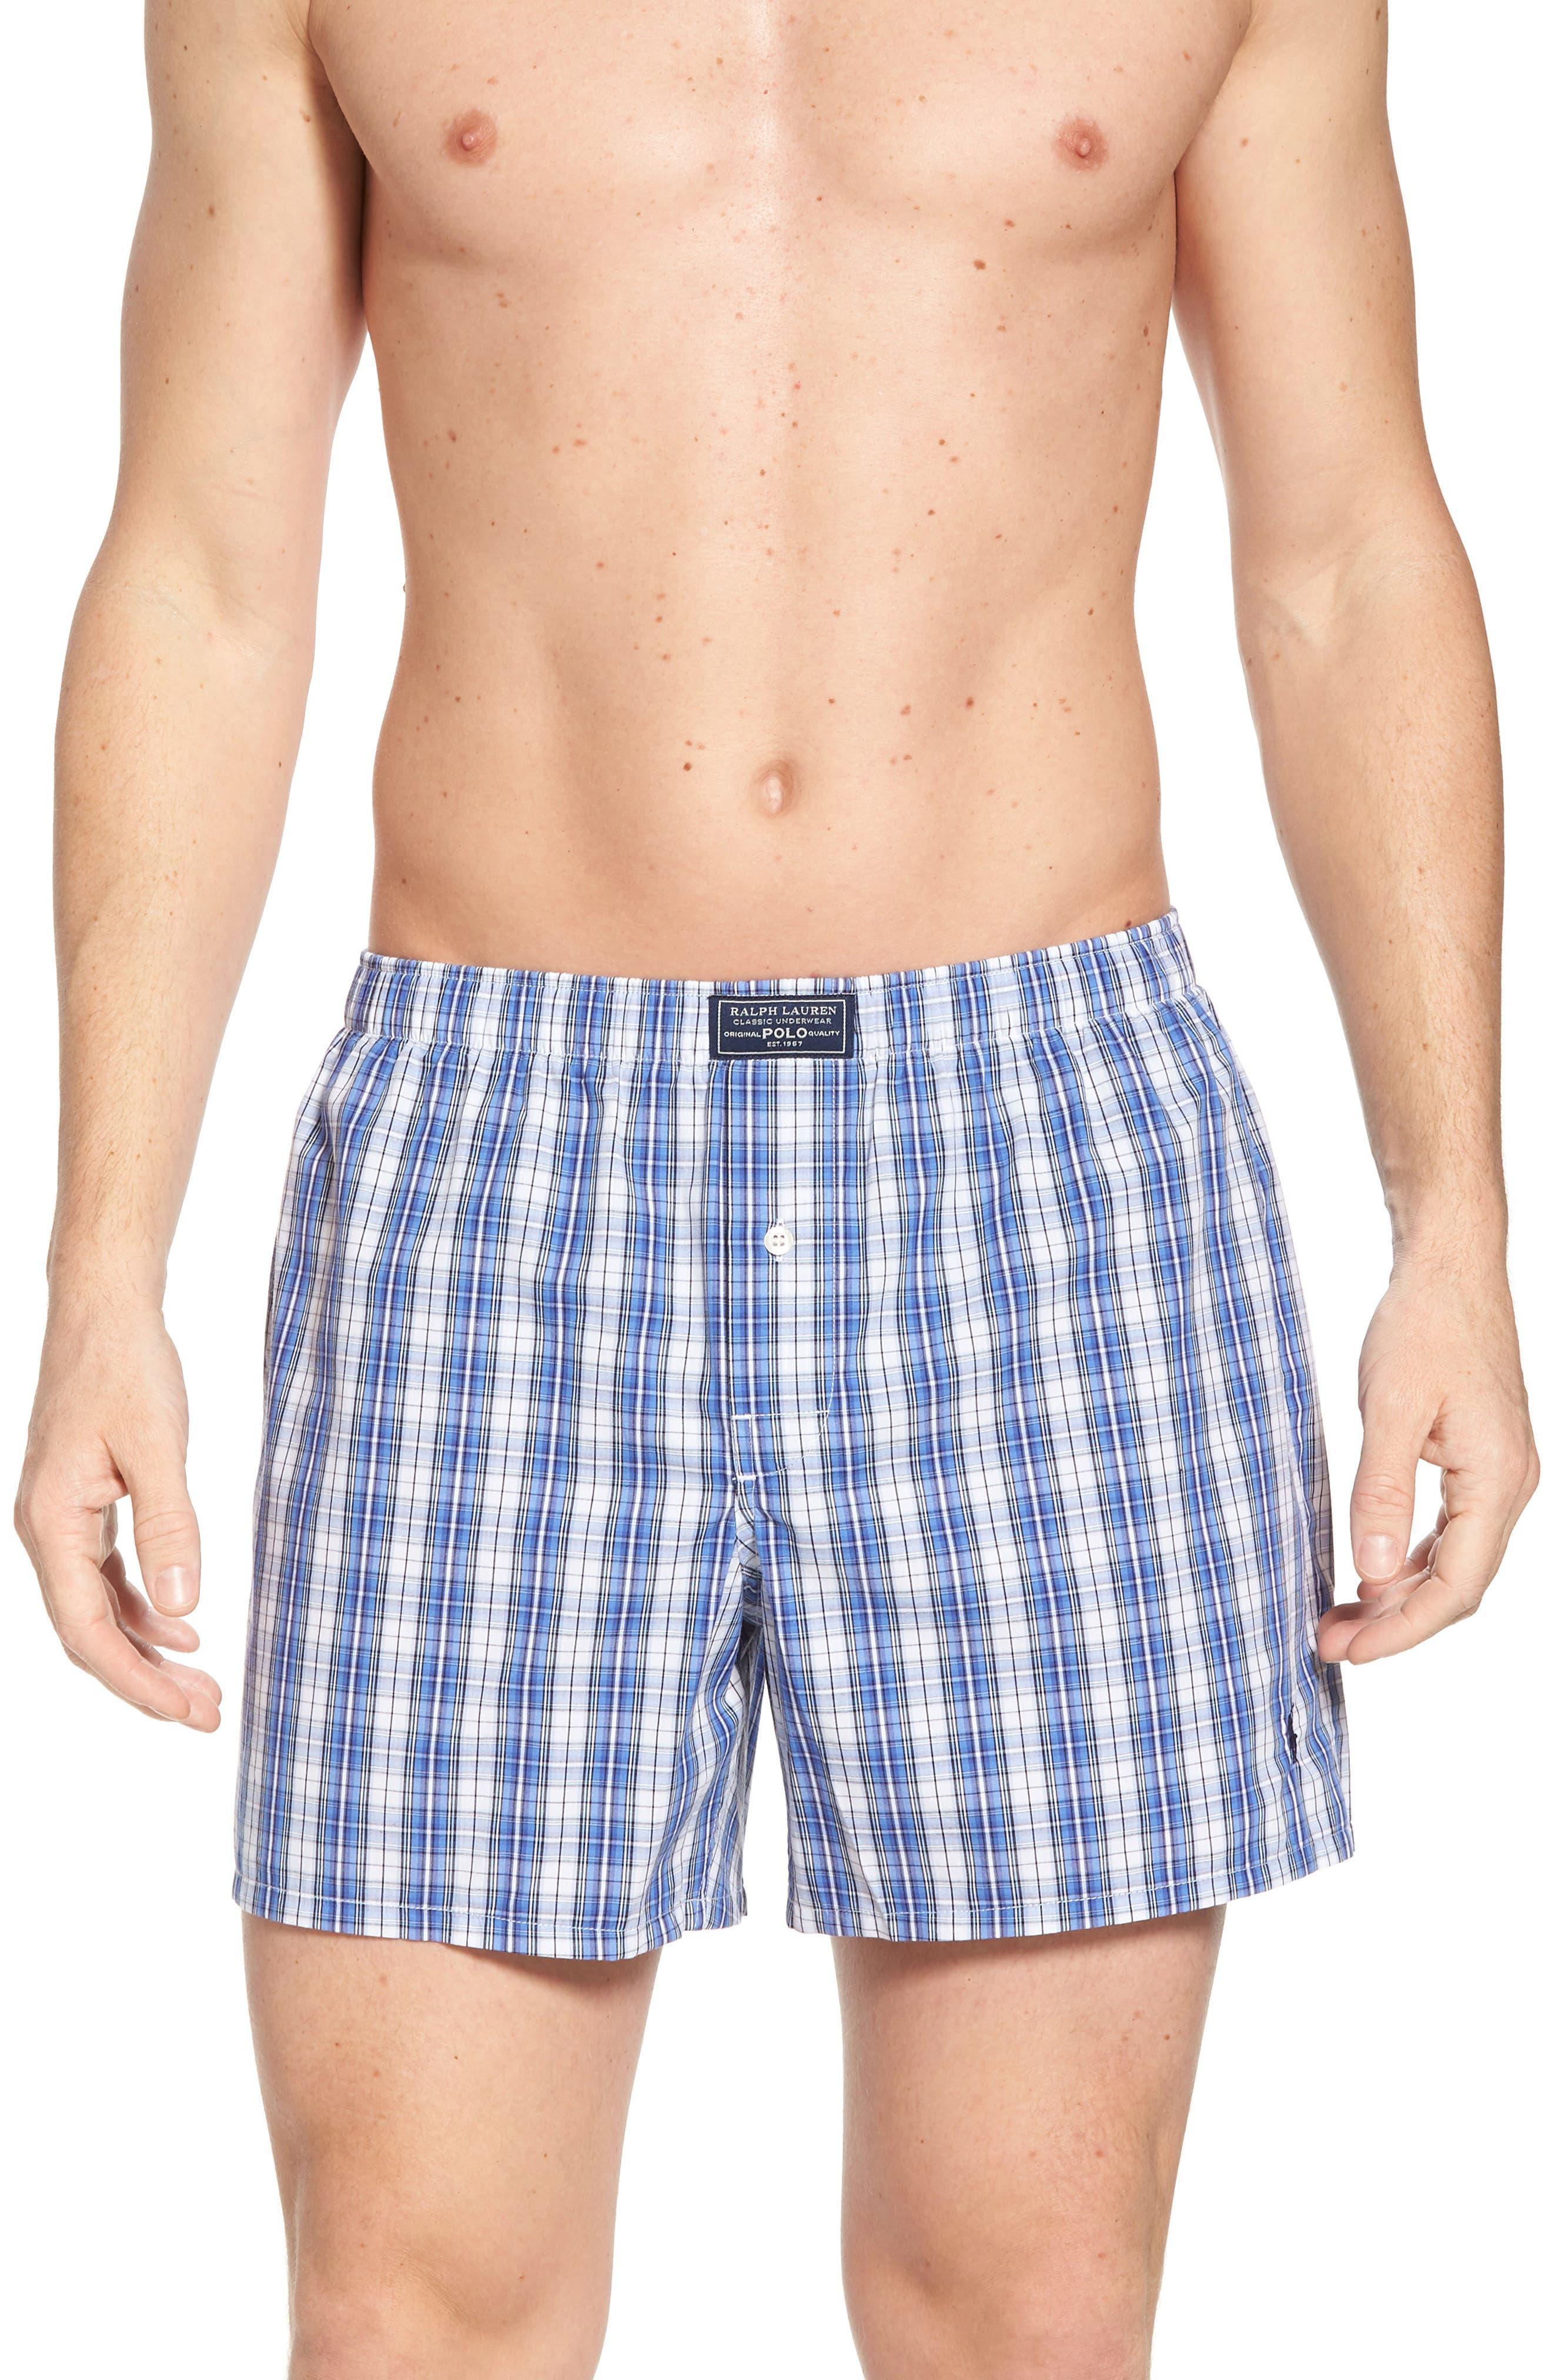 Polo Ralph Lauren Woven Cotton Boxers